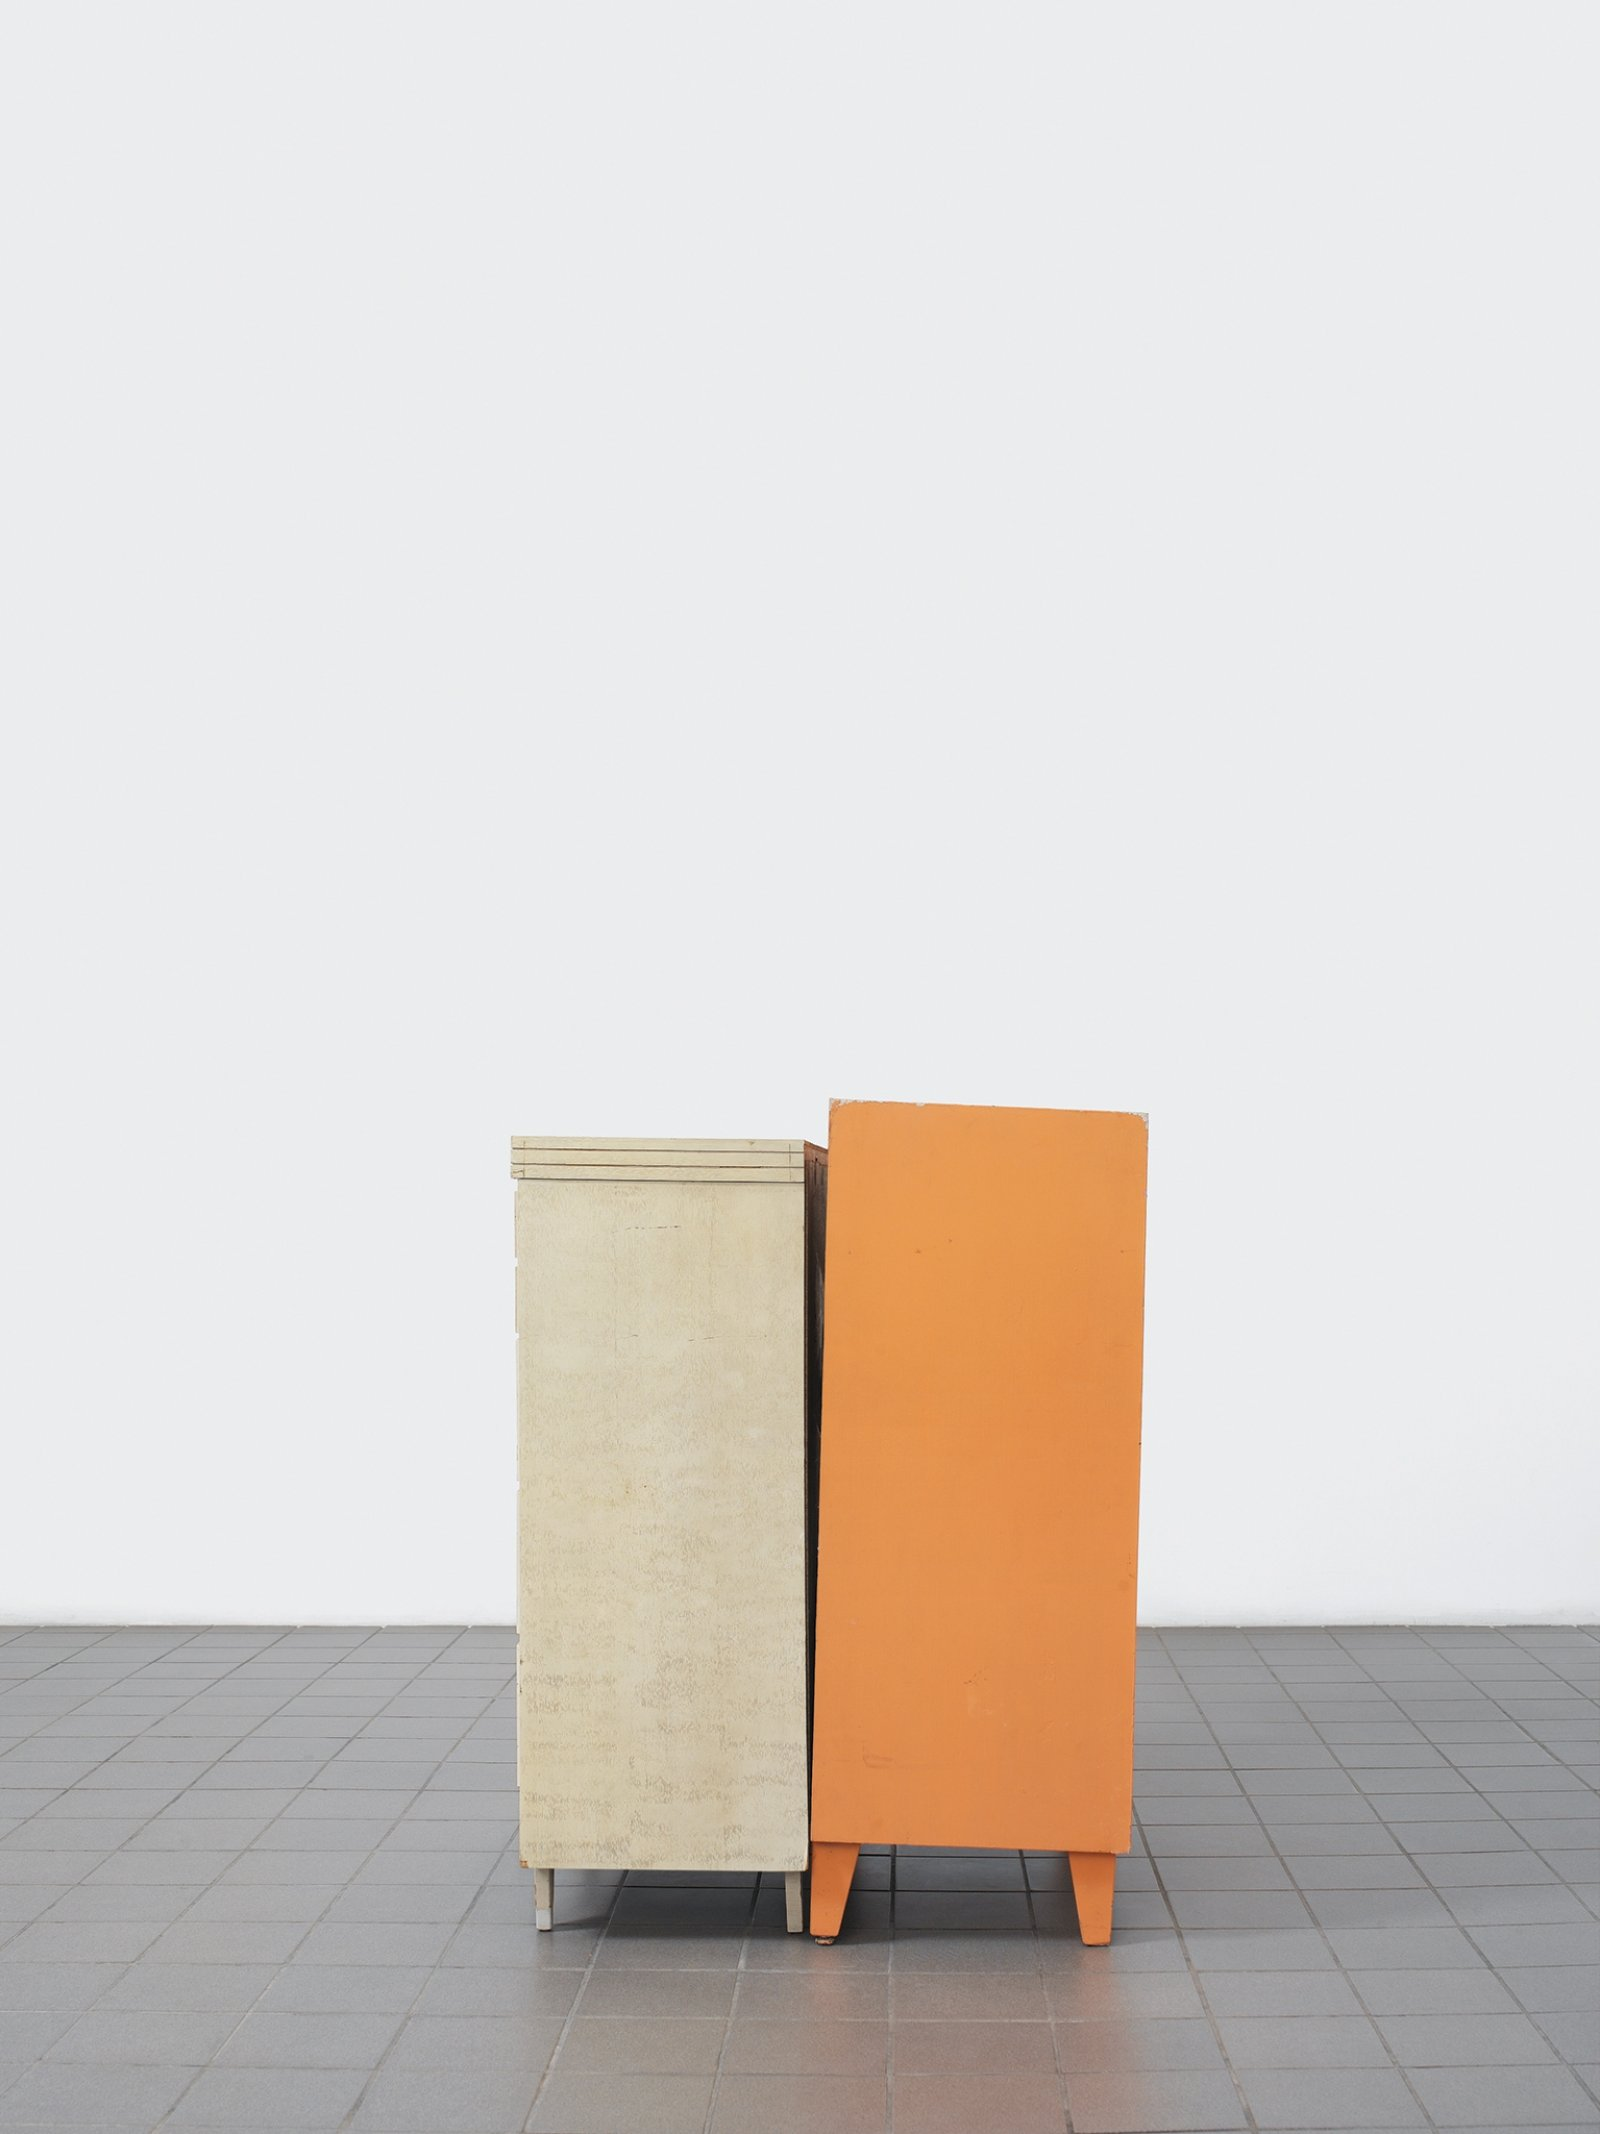 Geoffrey Farmer, Triangle (Pale Fire Freedom Machine), 2005, lightjet (endura archival photo paper), 50 x 38 in. (126 x 97 cm)